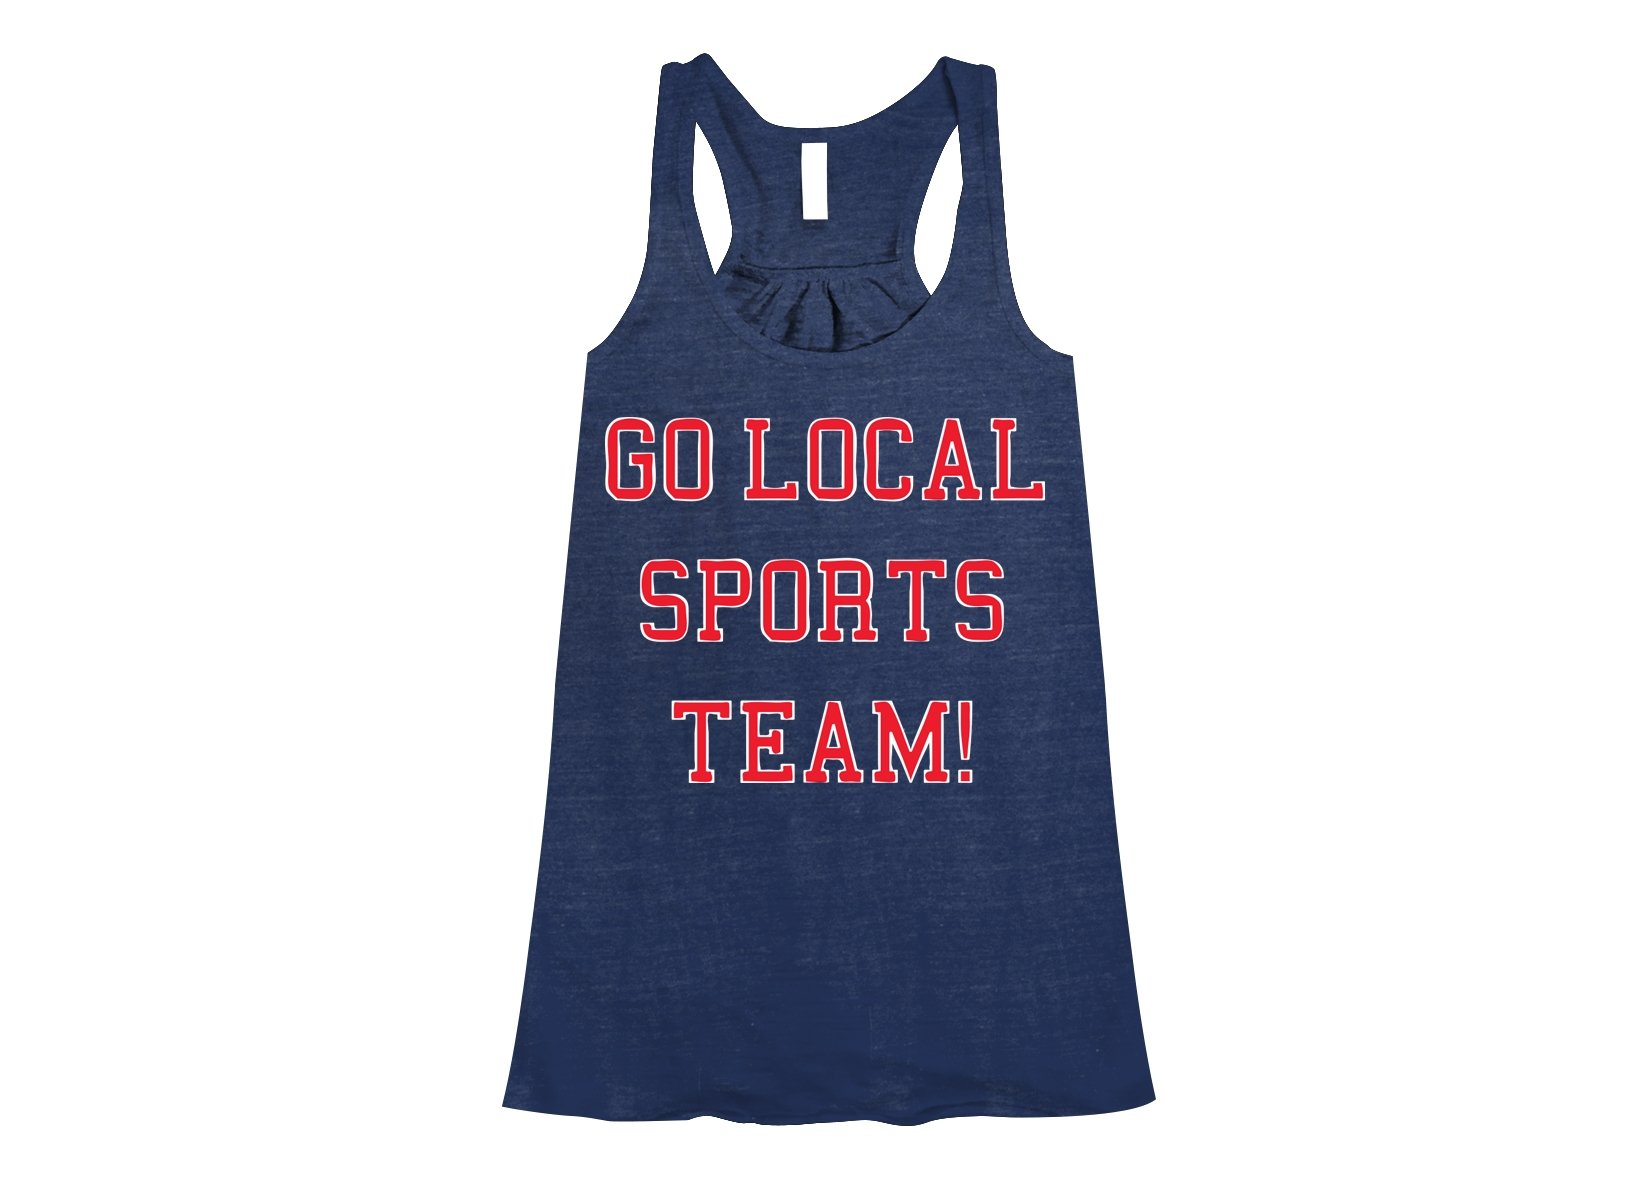 Go Local Sports Team! on Womens Tanks T-Shirt